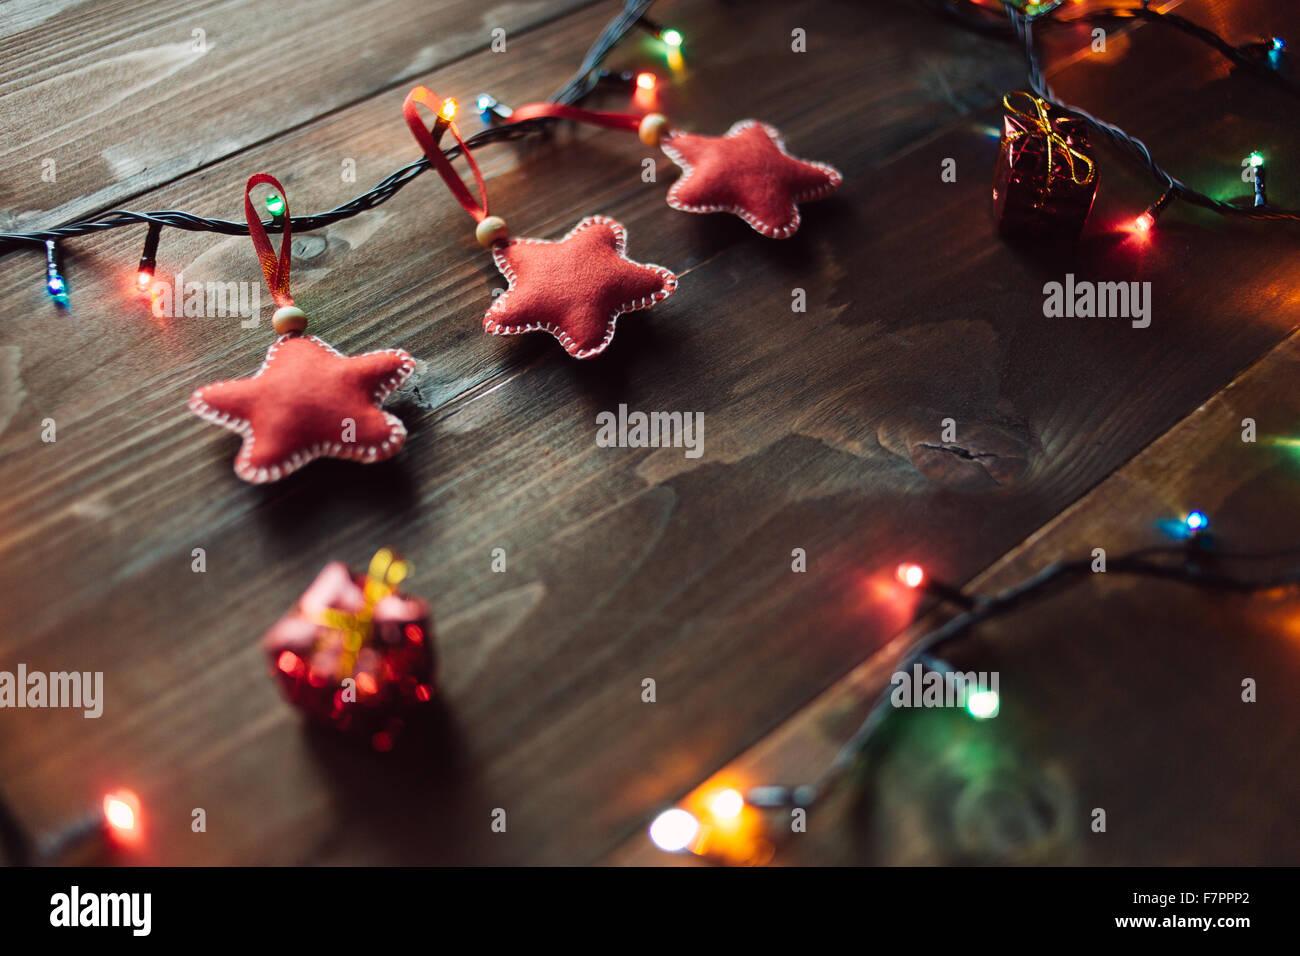 Handmade red stars with garland lights - Stock Image